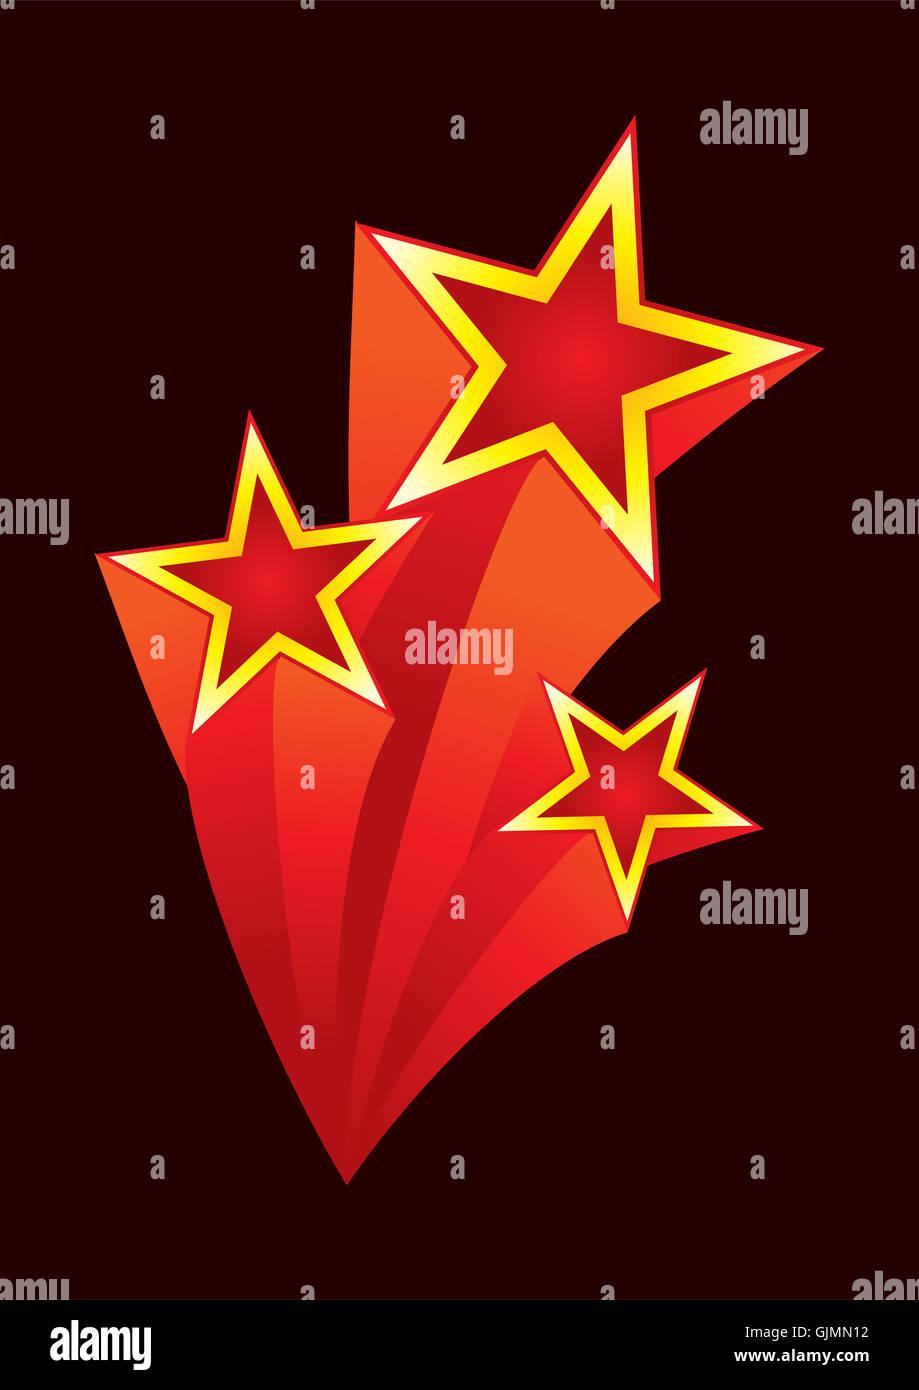 creative stars asterisks - Stock Image